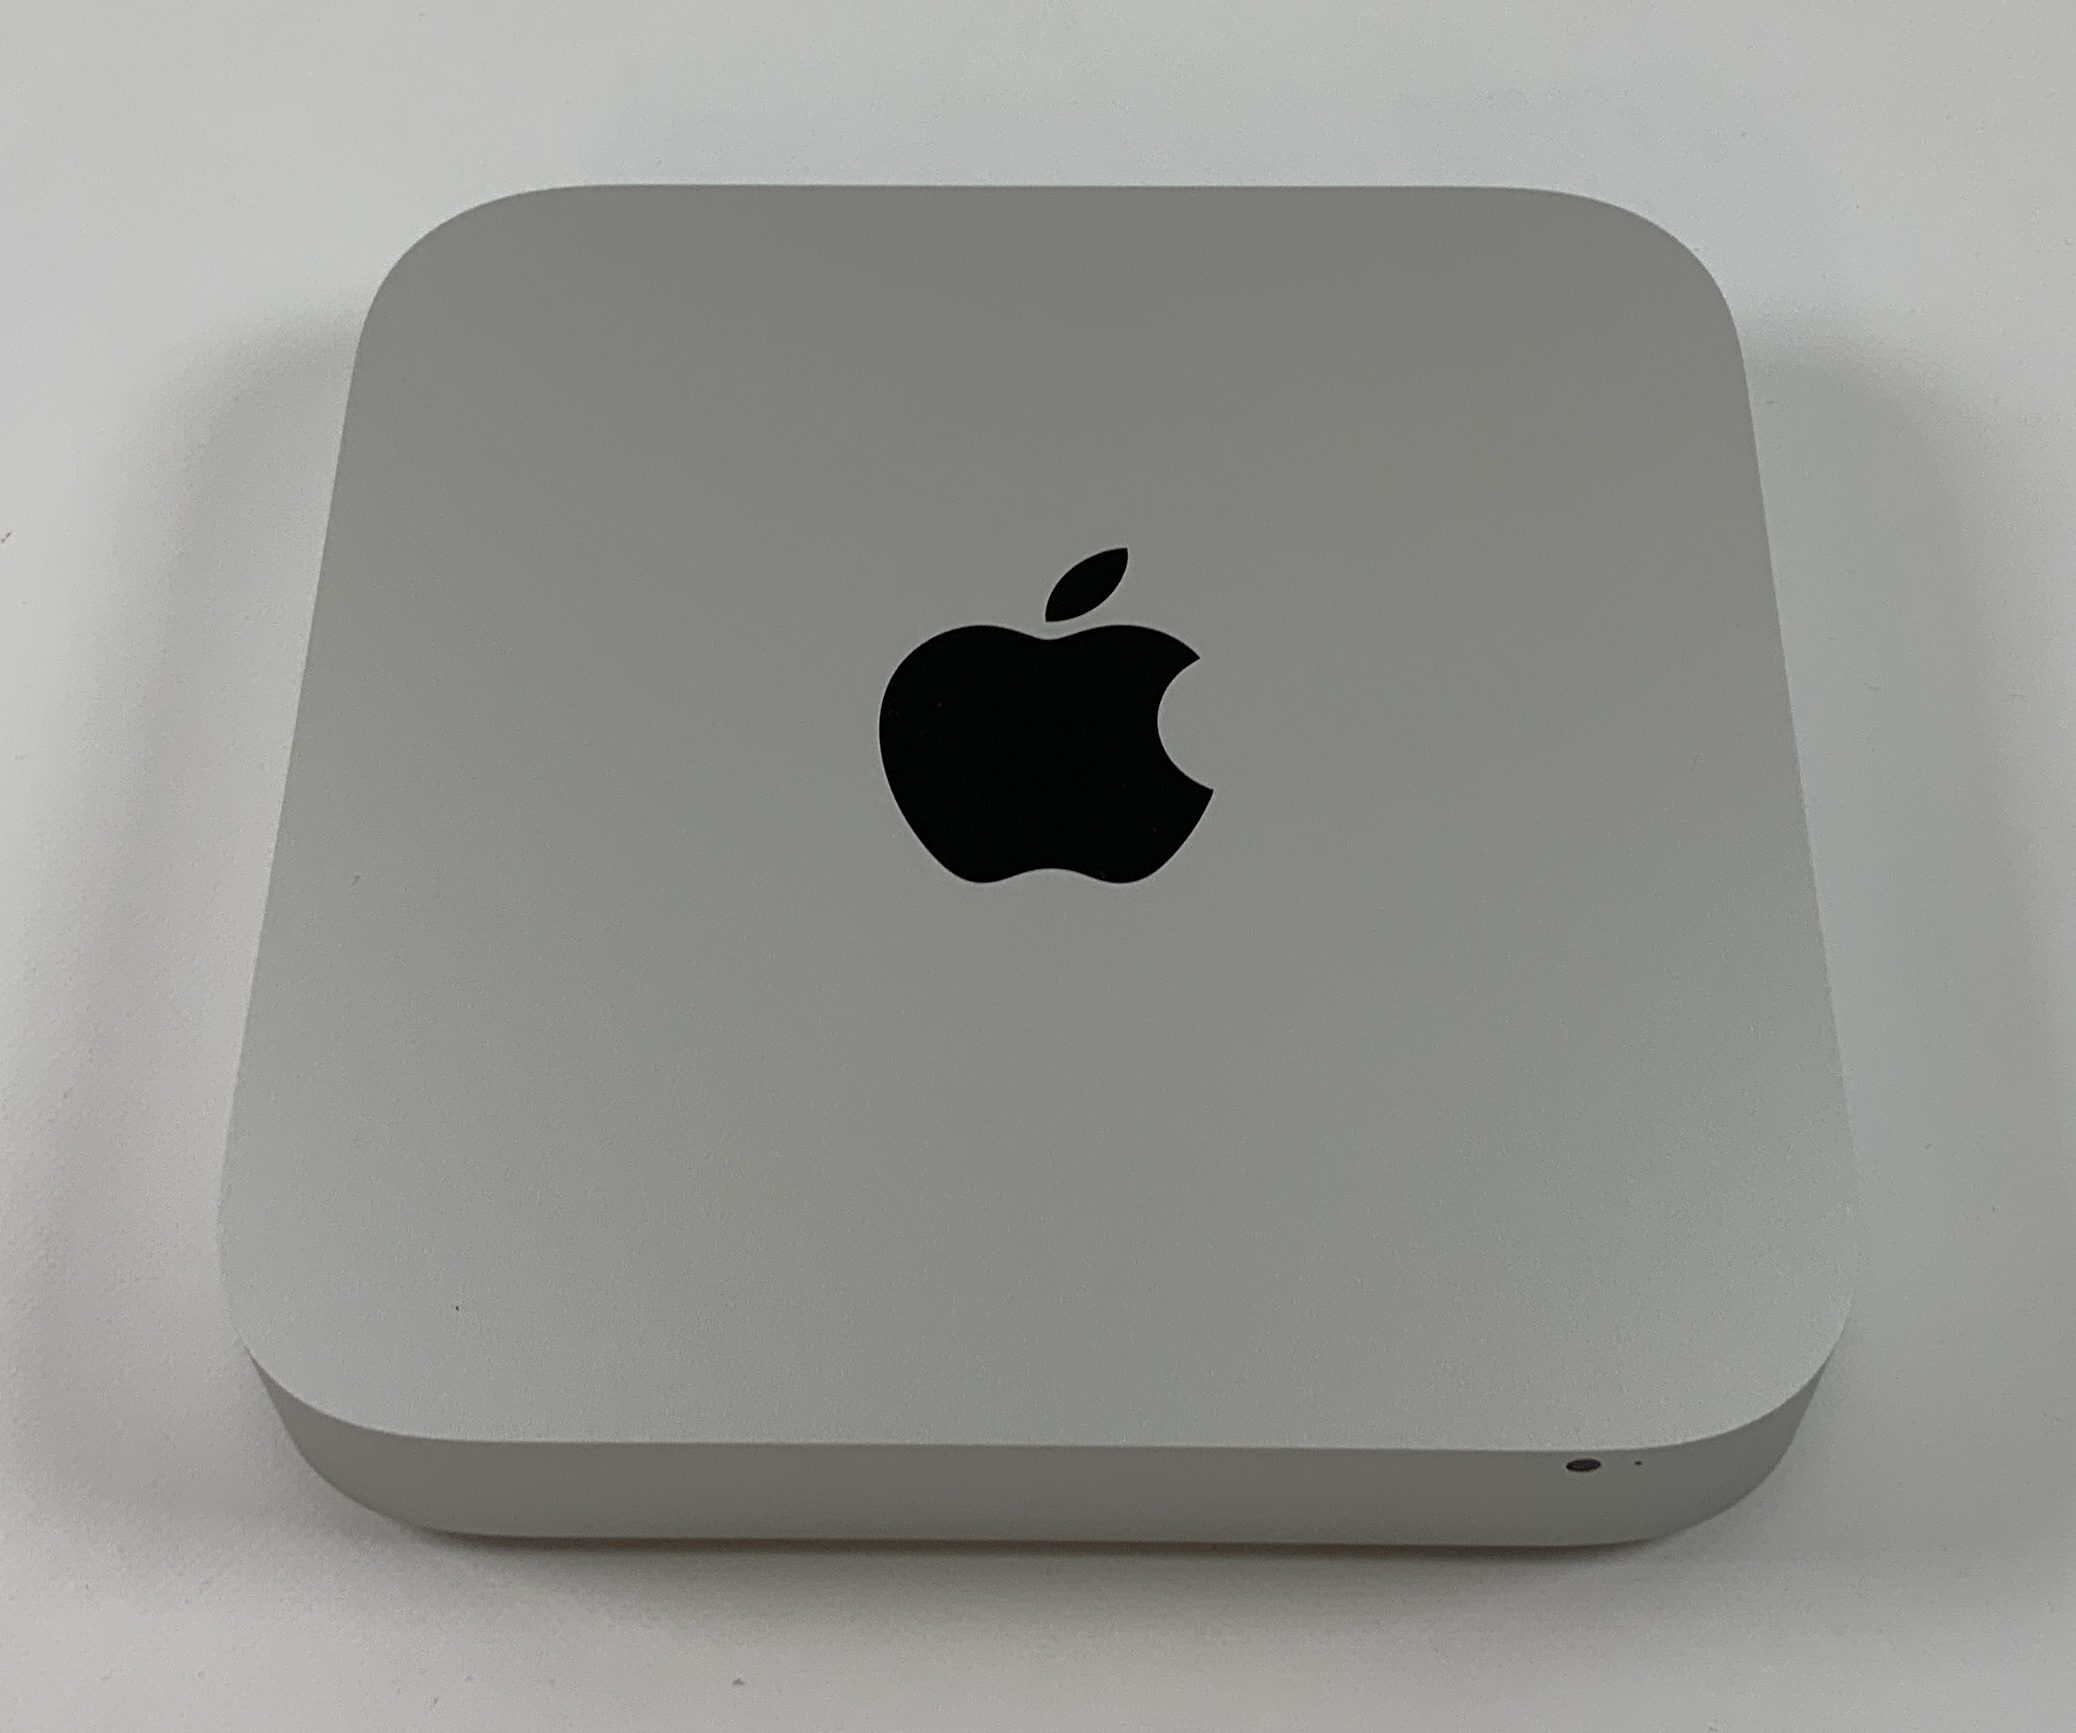 Mac Mini Late 2014 (Intel Core i5 2.8 GHz 8 GB RAM 1 TB Fusion Drive), Intel Core i5 2.8 GHz, 8 GB RAM, 1 TB Fusion Drive, bild 1